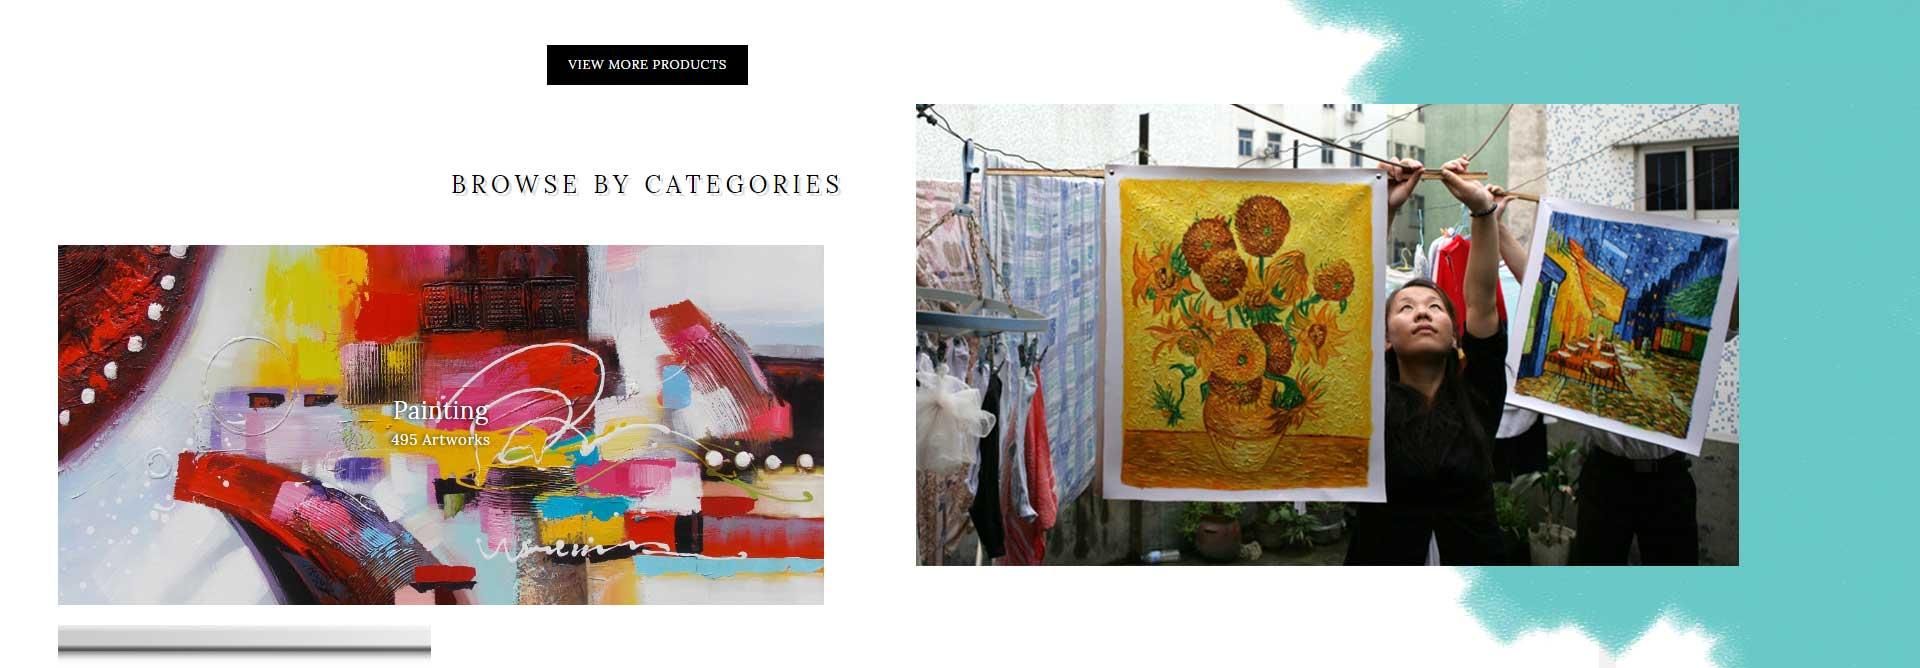 professiona1 photographe 4a - ۹۹ روش برای فروش آثار هنری